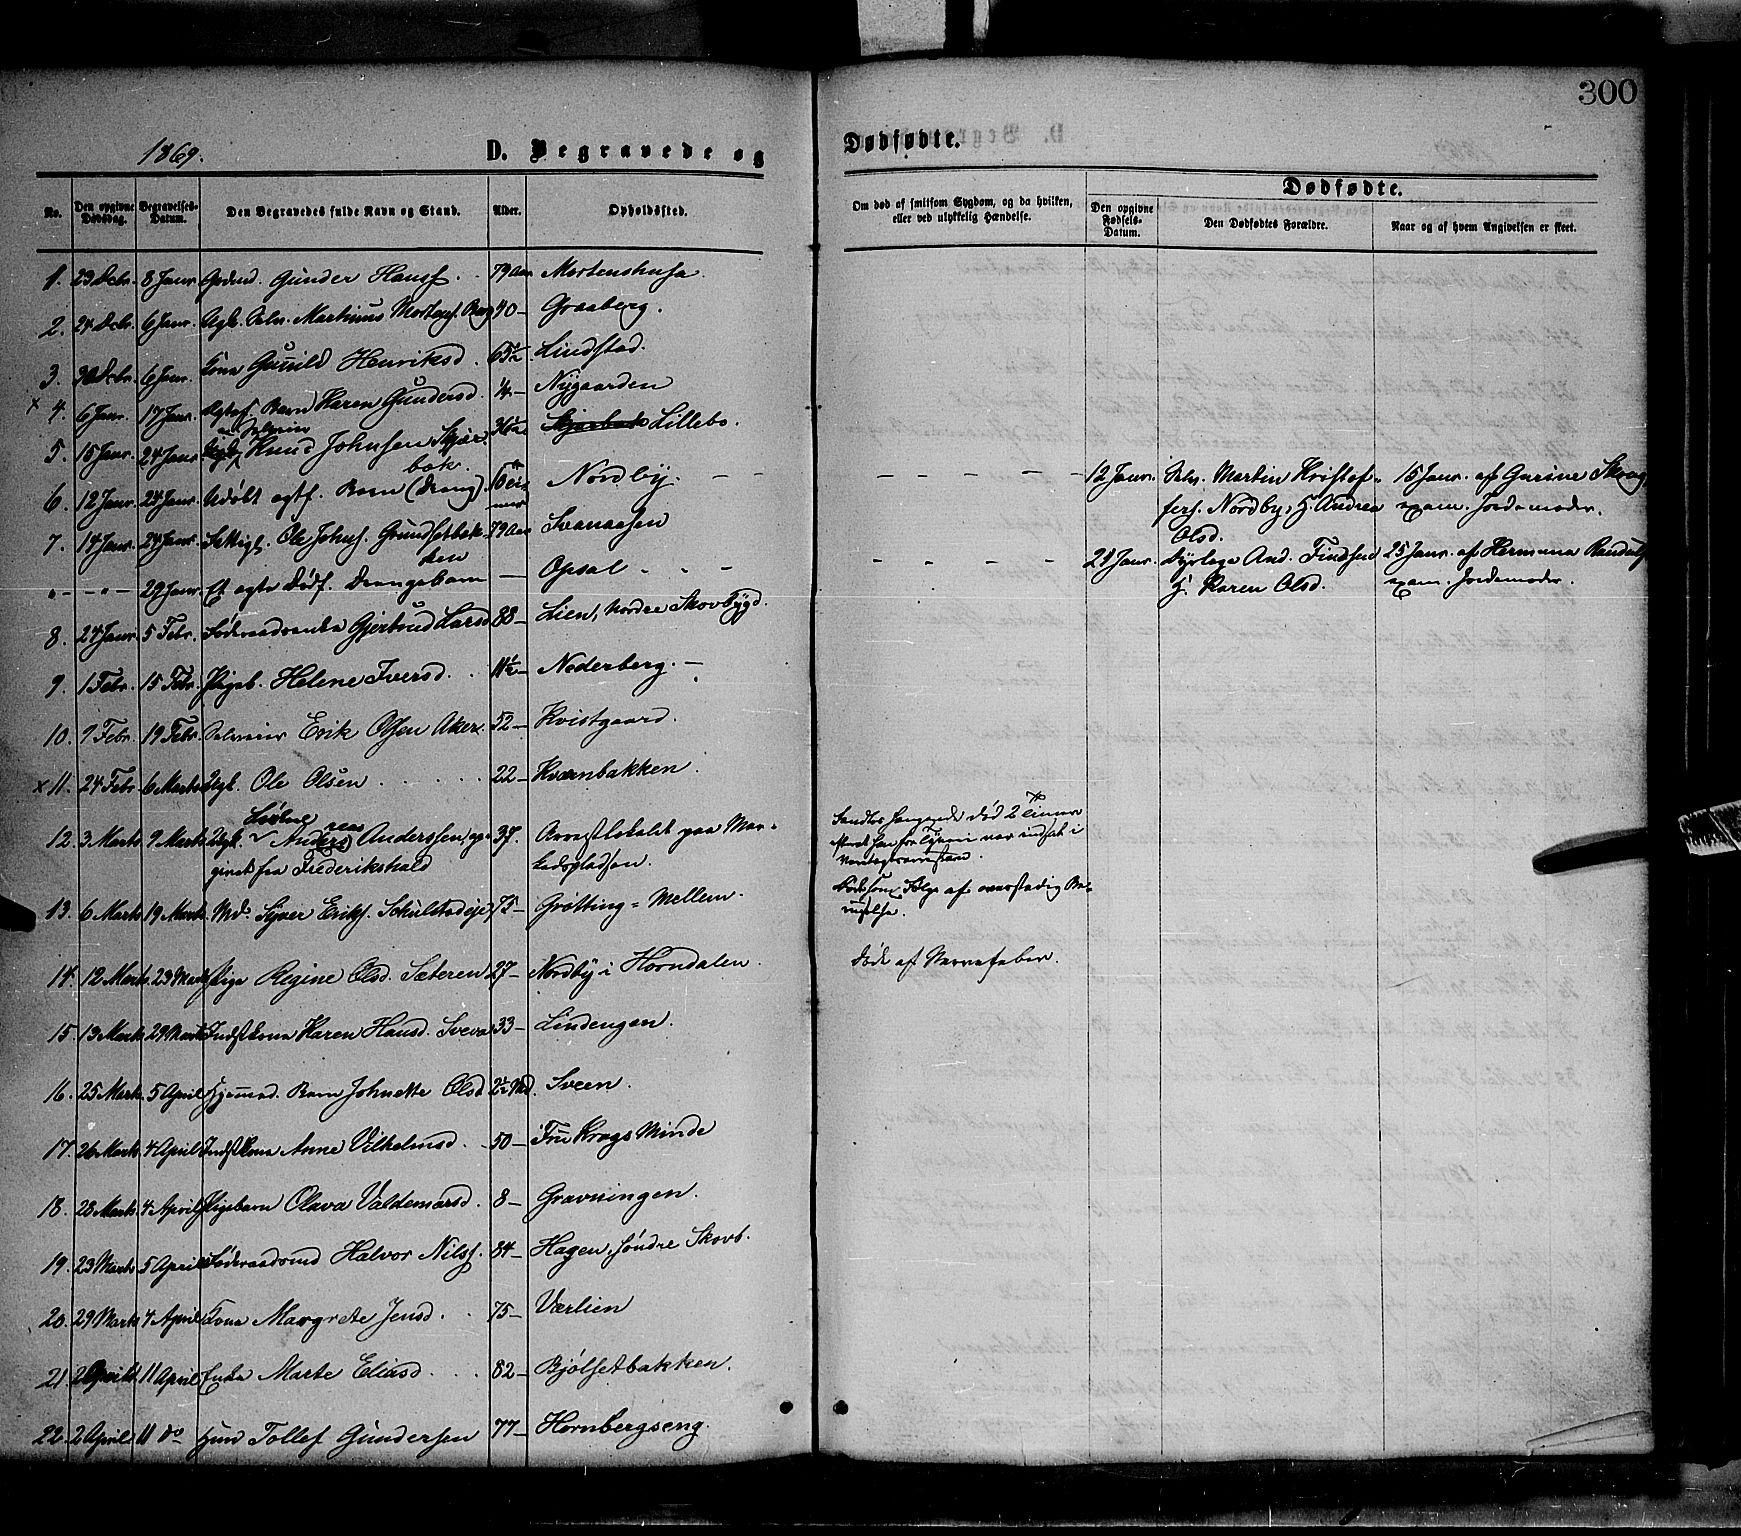 SAH, Elverum prestekontor, H/Ha/Haa/L0011: Ministerialbok nr. 11, 1869-1879, s. 300